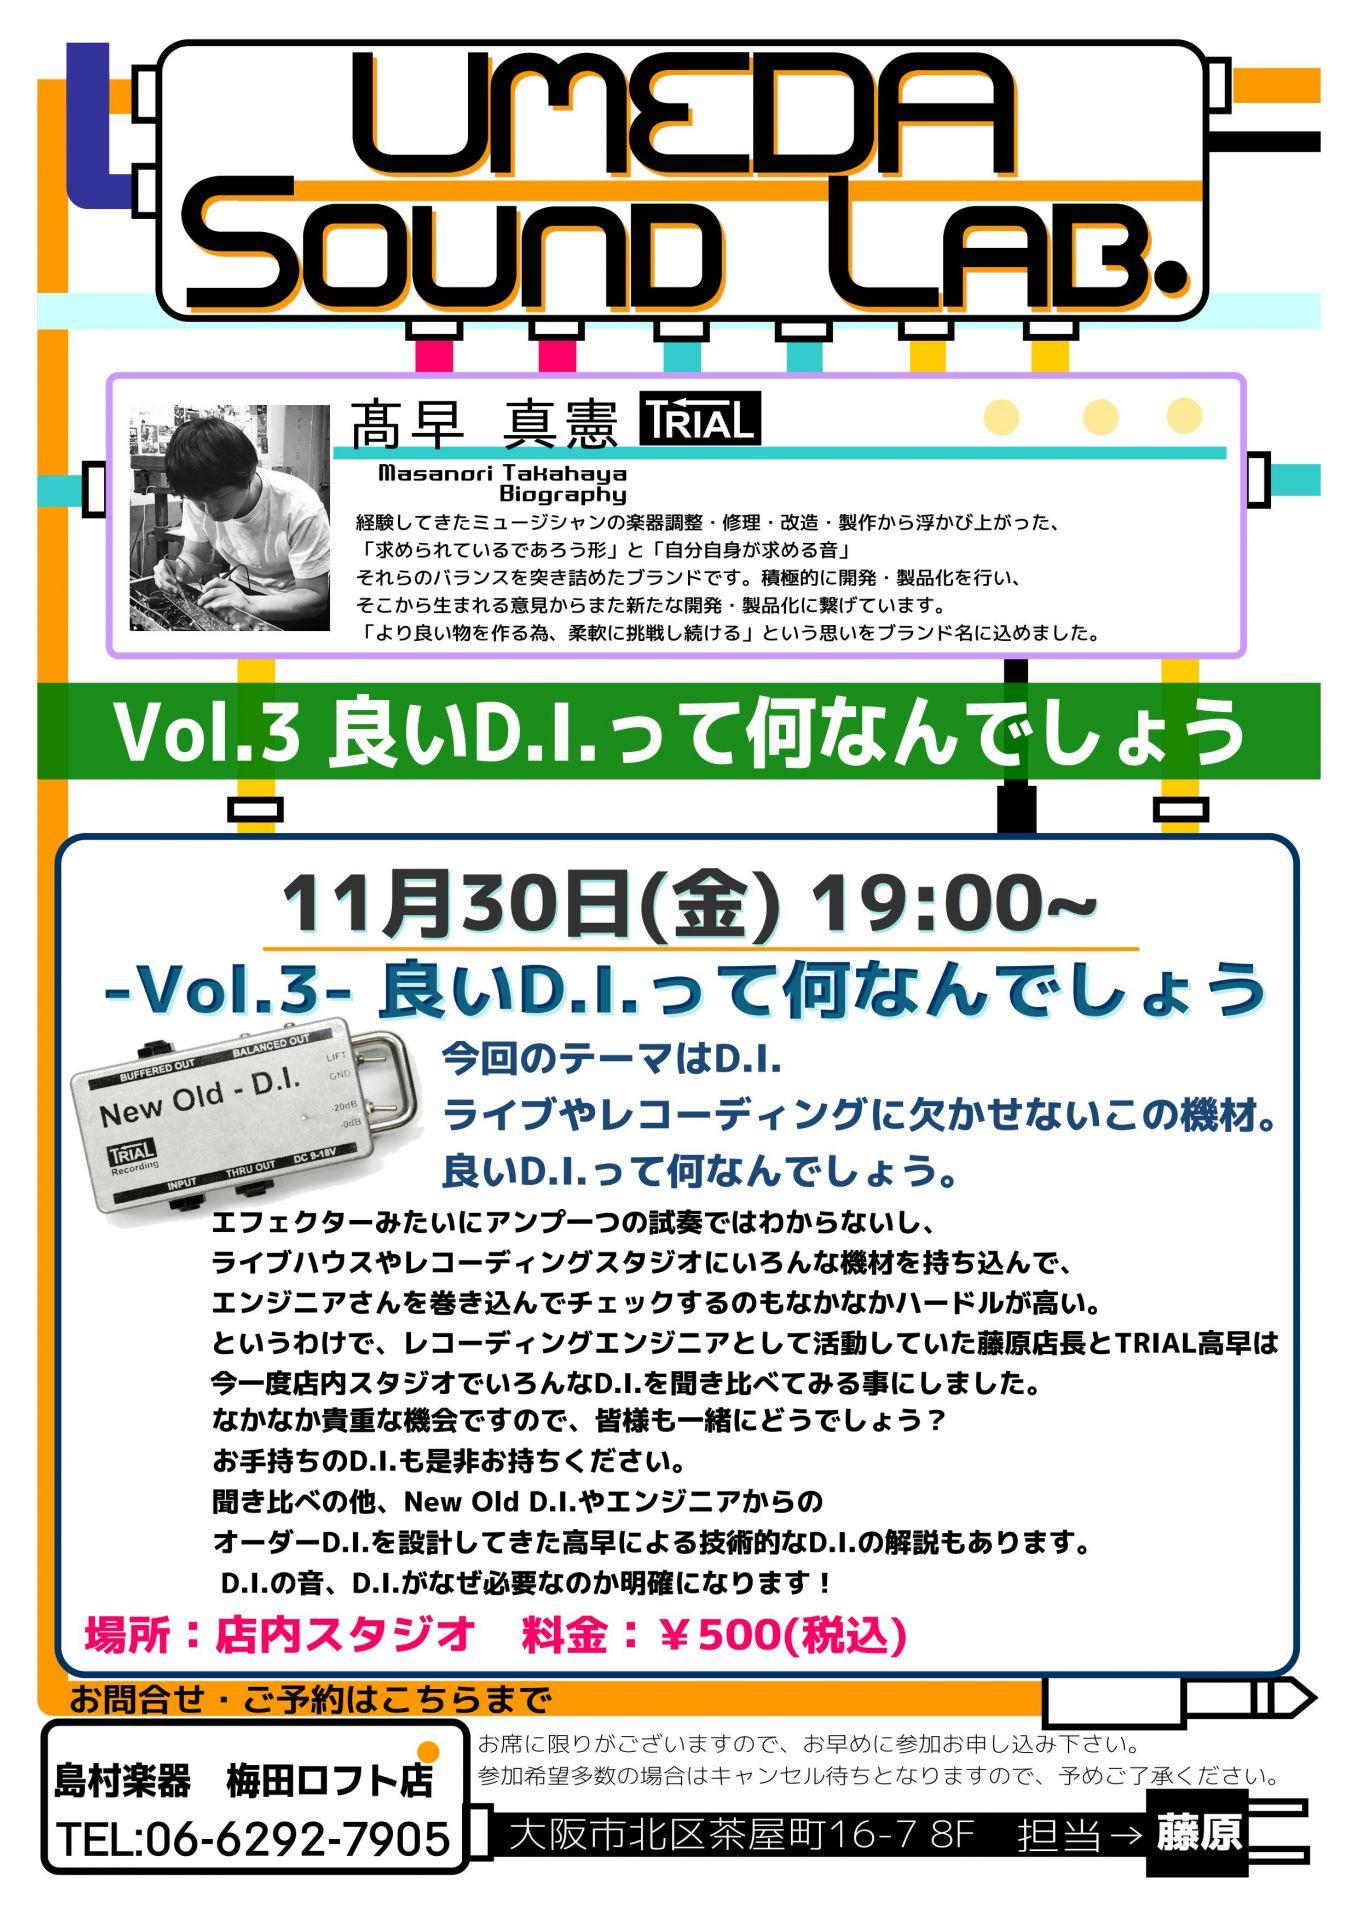 UMEDA SOUND LAB. Vol.3 D.I.について